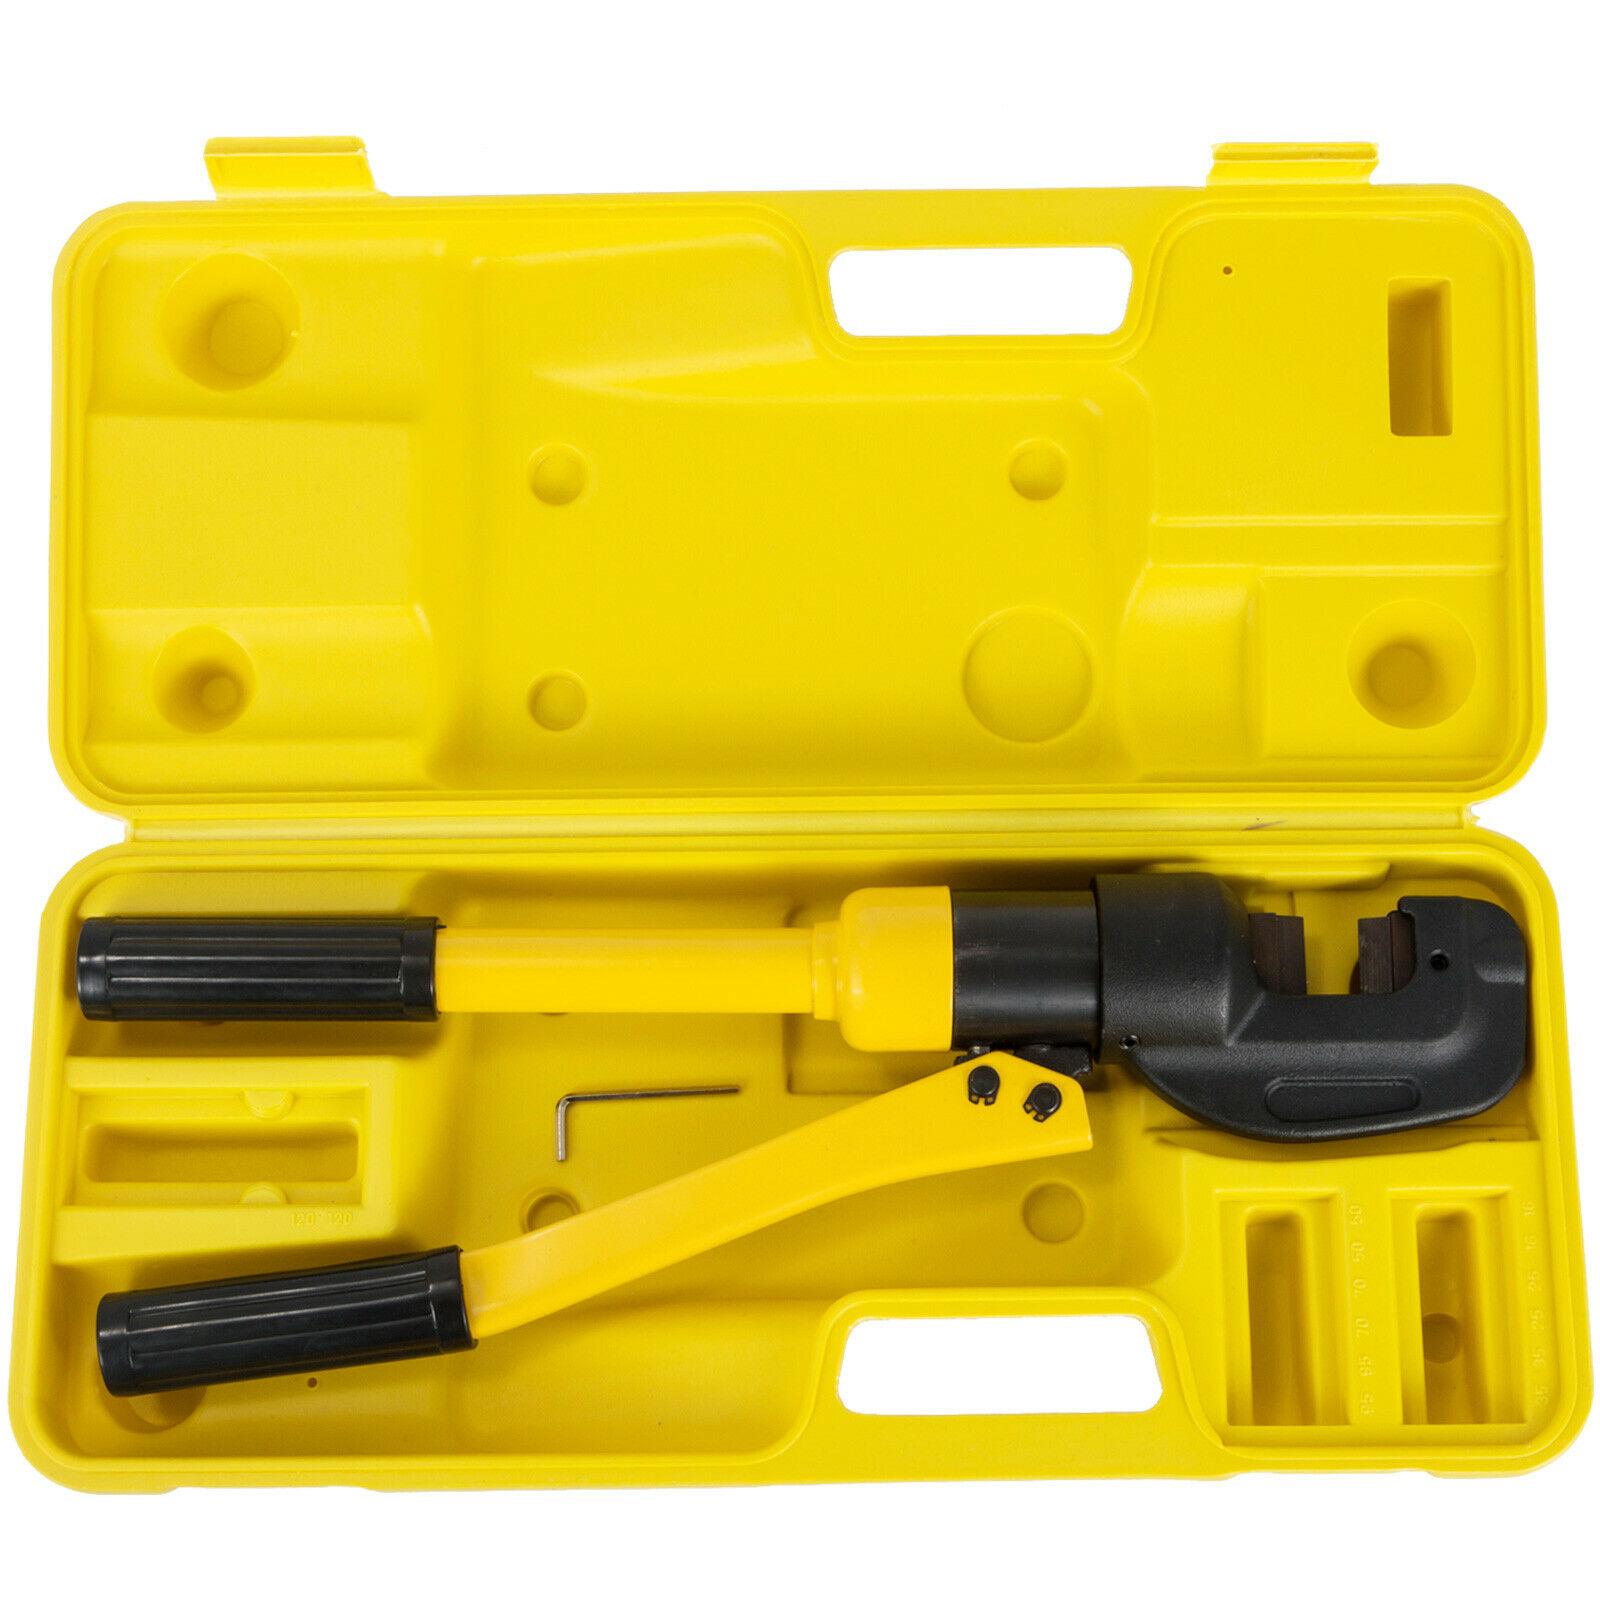 VEVOR 8 Ton Integral Hydraulic Rebar Cutter Clamp W/ Insulated Handle Max Cutting 5/8